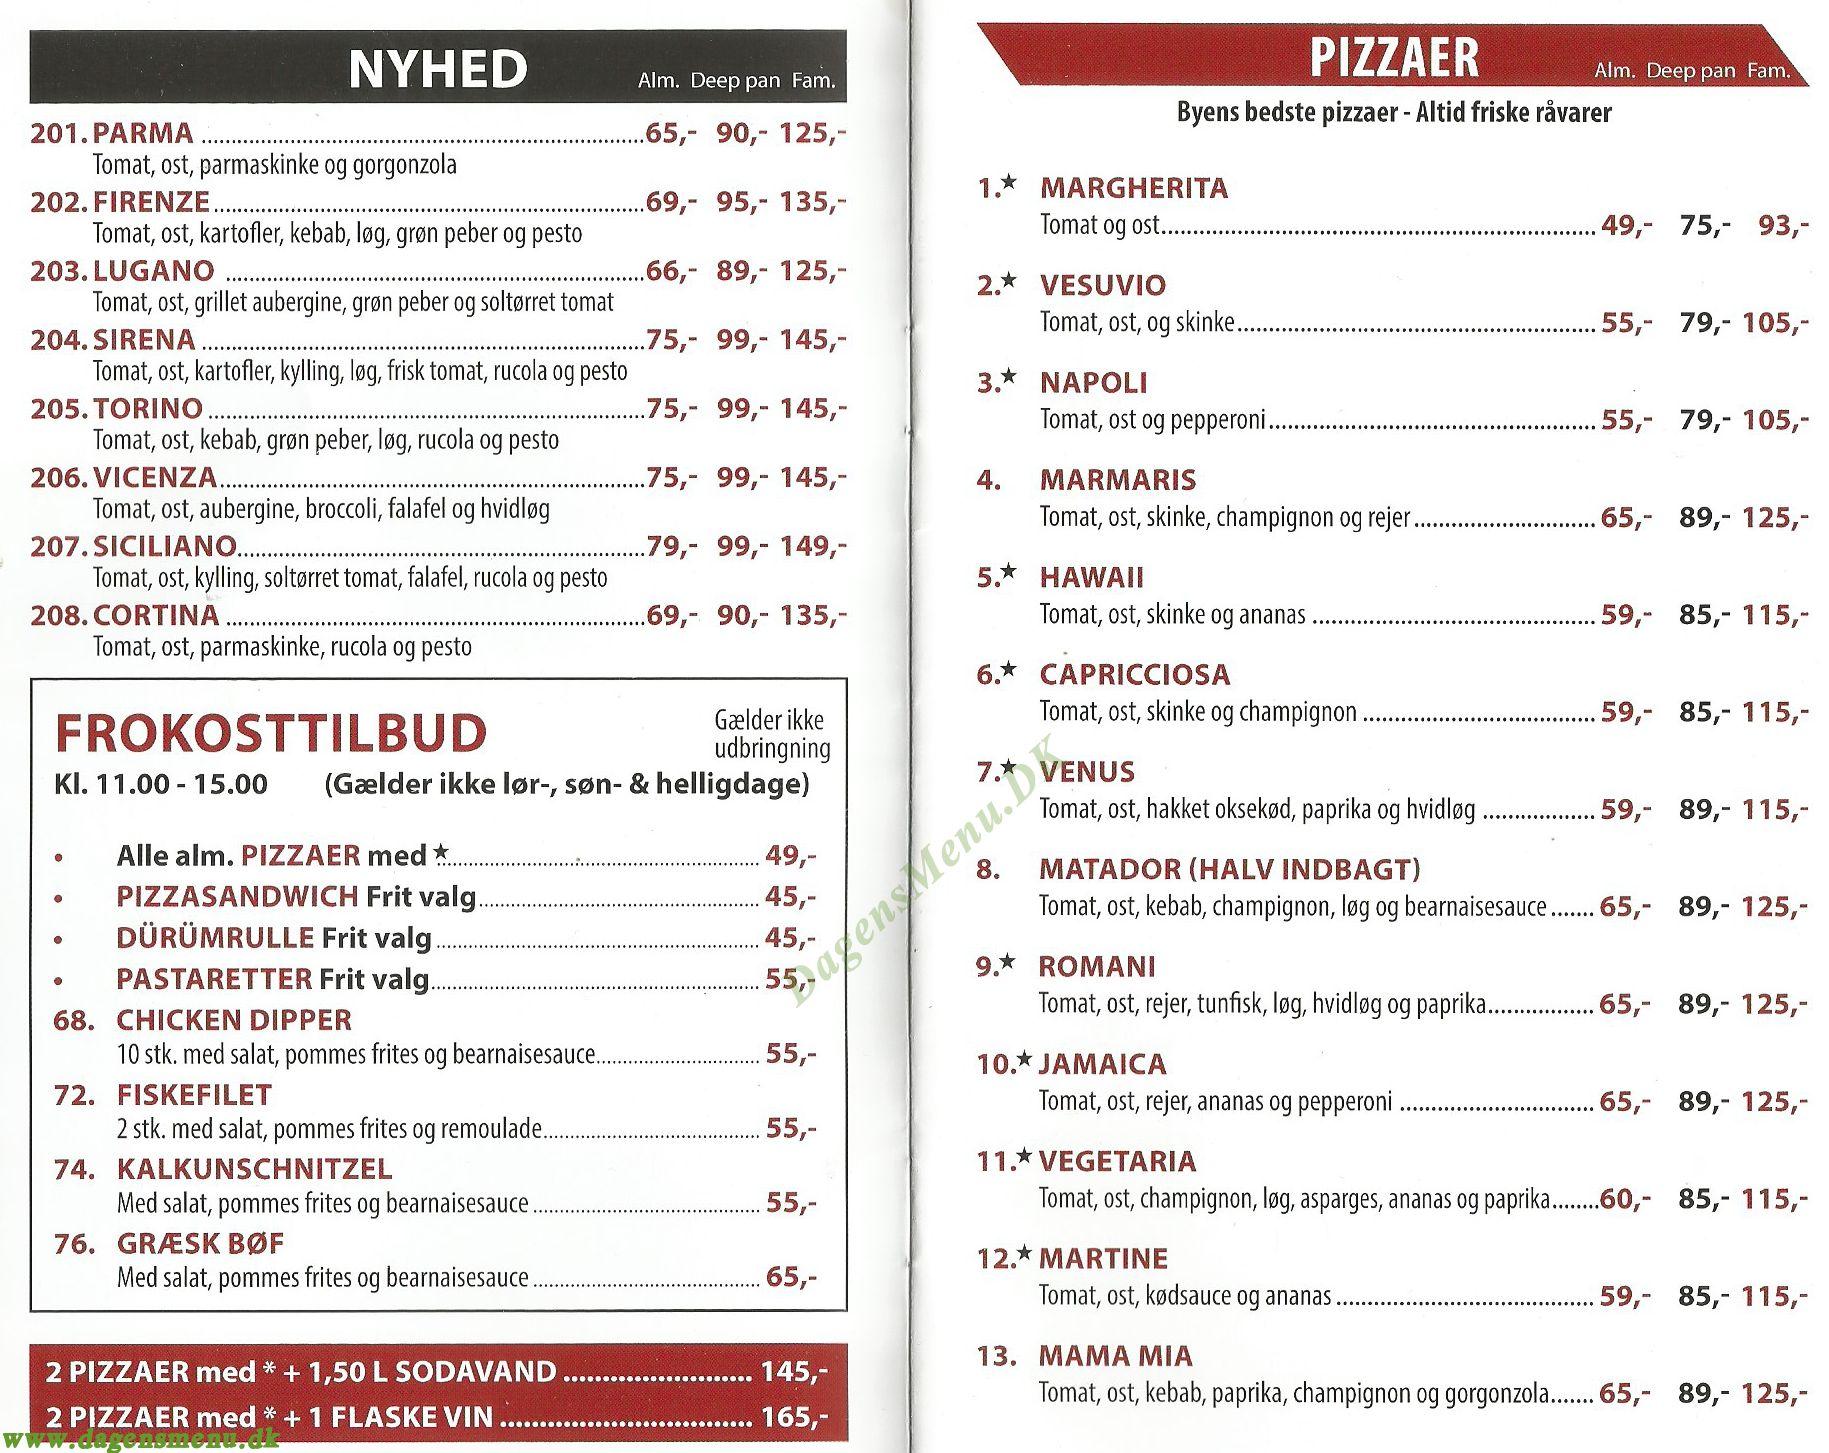 Pizza 2000 - Menukort